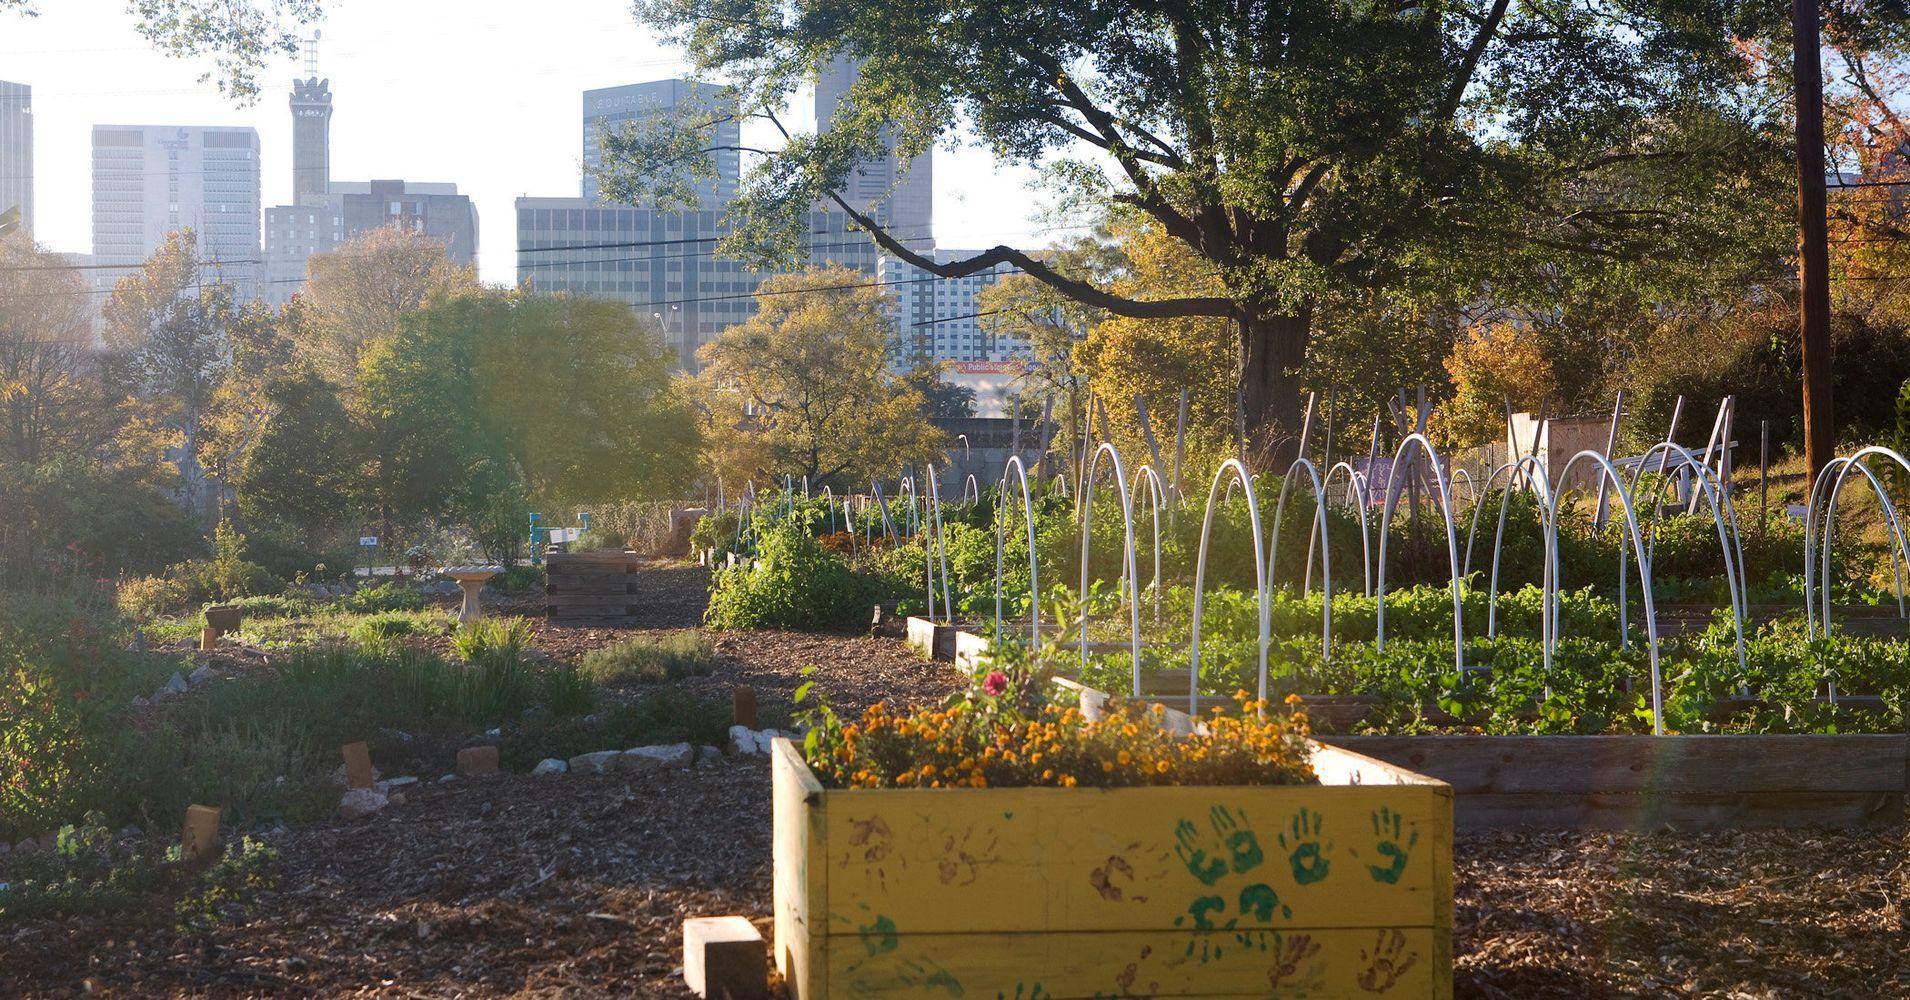 Urban Farming | HuffPost